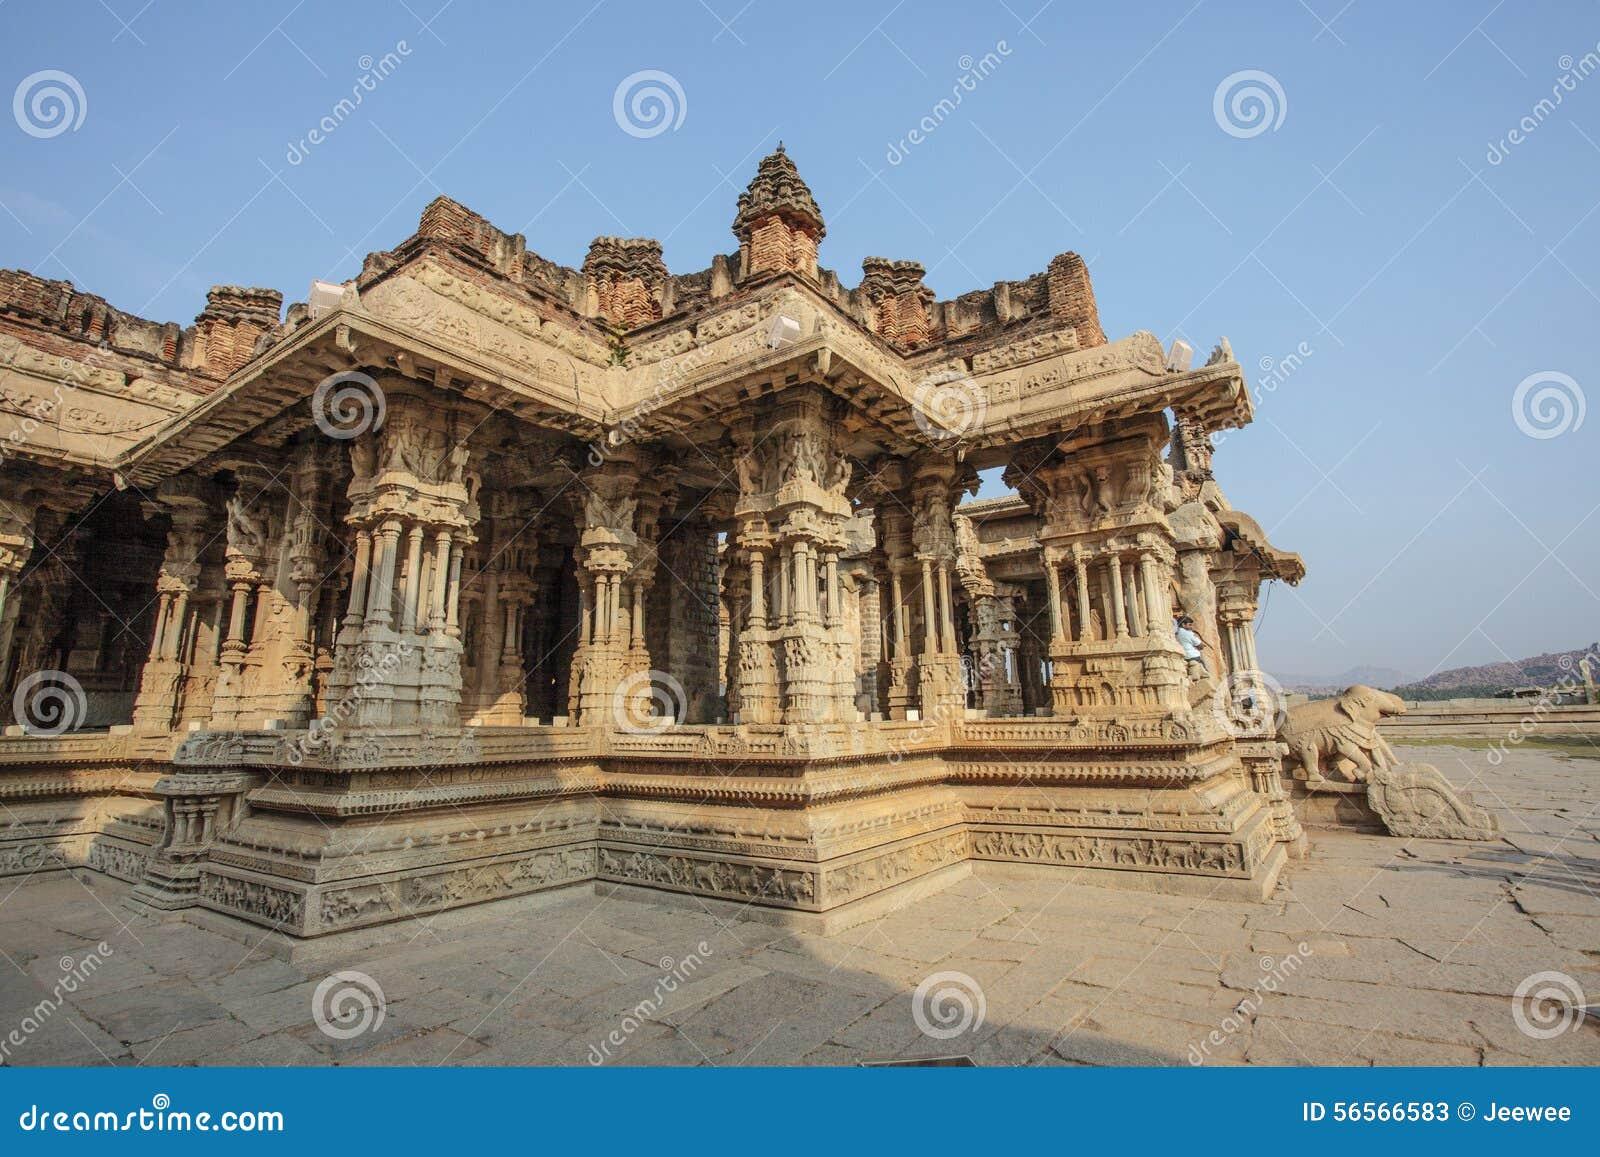 Download Μέσα στον ινδό ναό Vittala στην αρχαία περιοχή Hampi, Karnataka, Ινδία Στοκ Εικόνα - εικόνα από κληρονομιά, κόσμος: 56566583